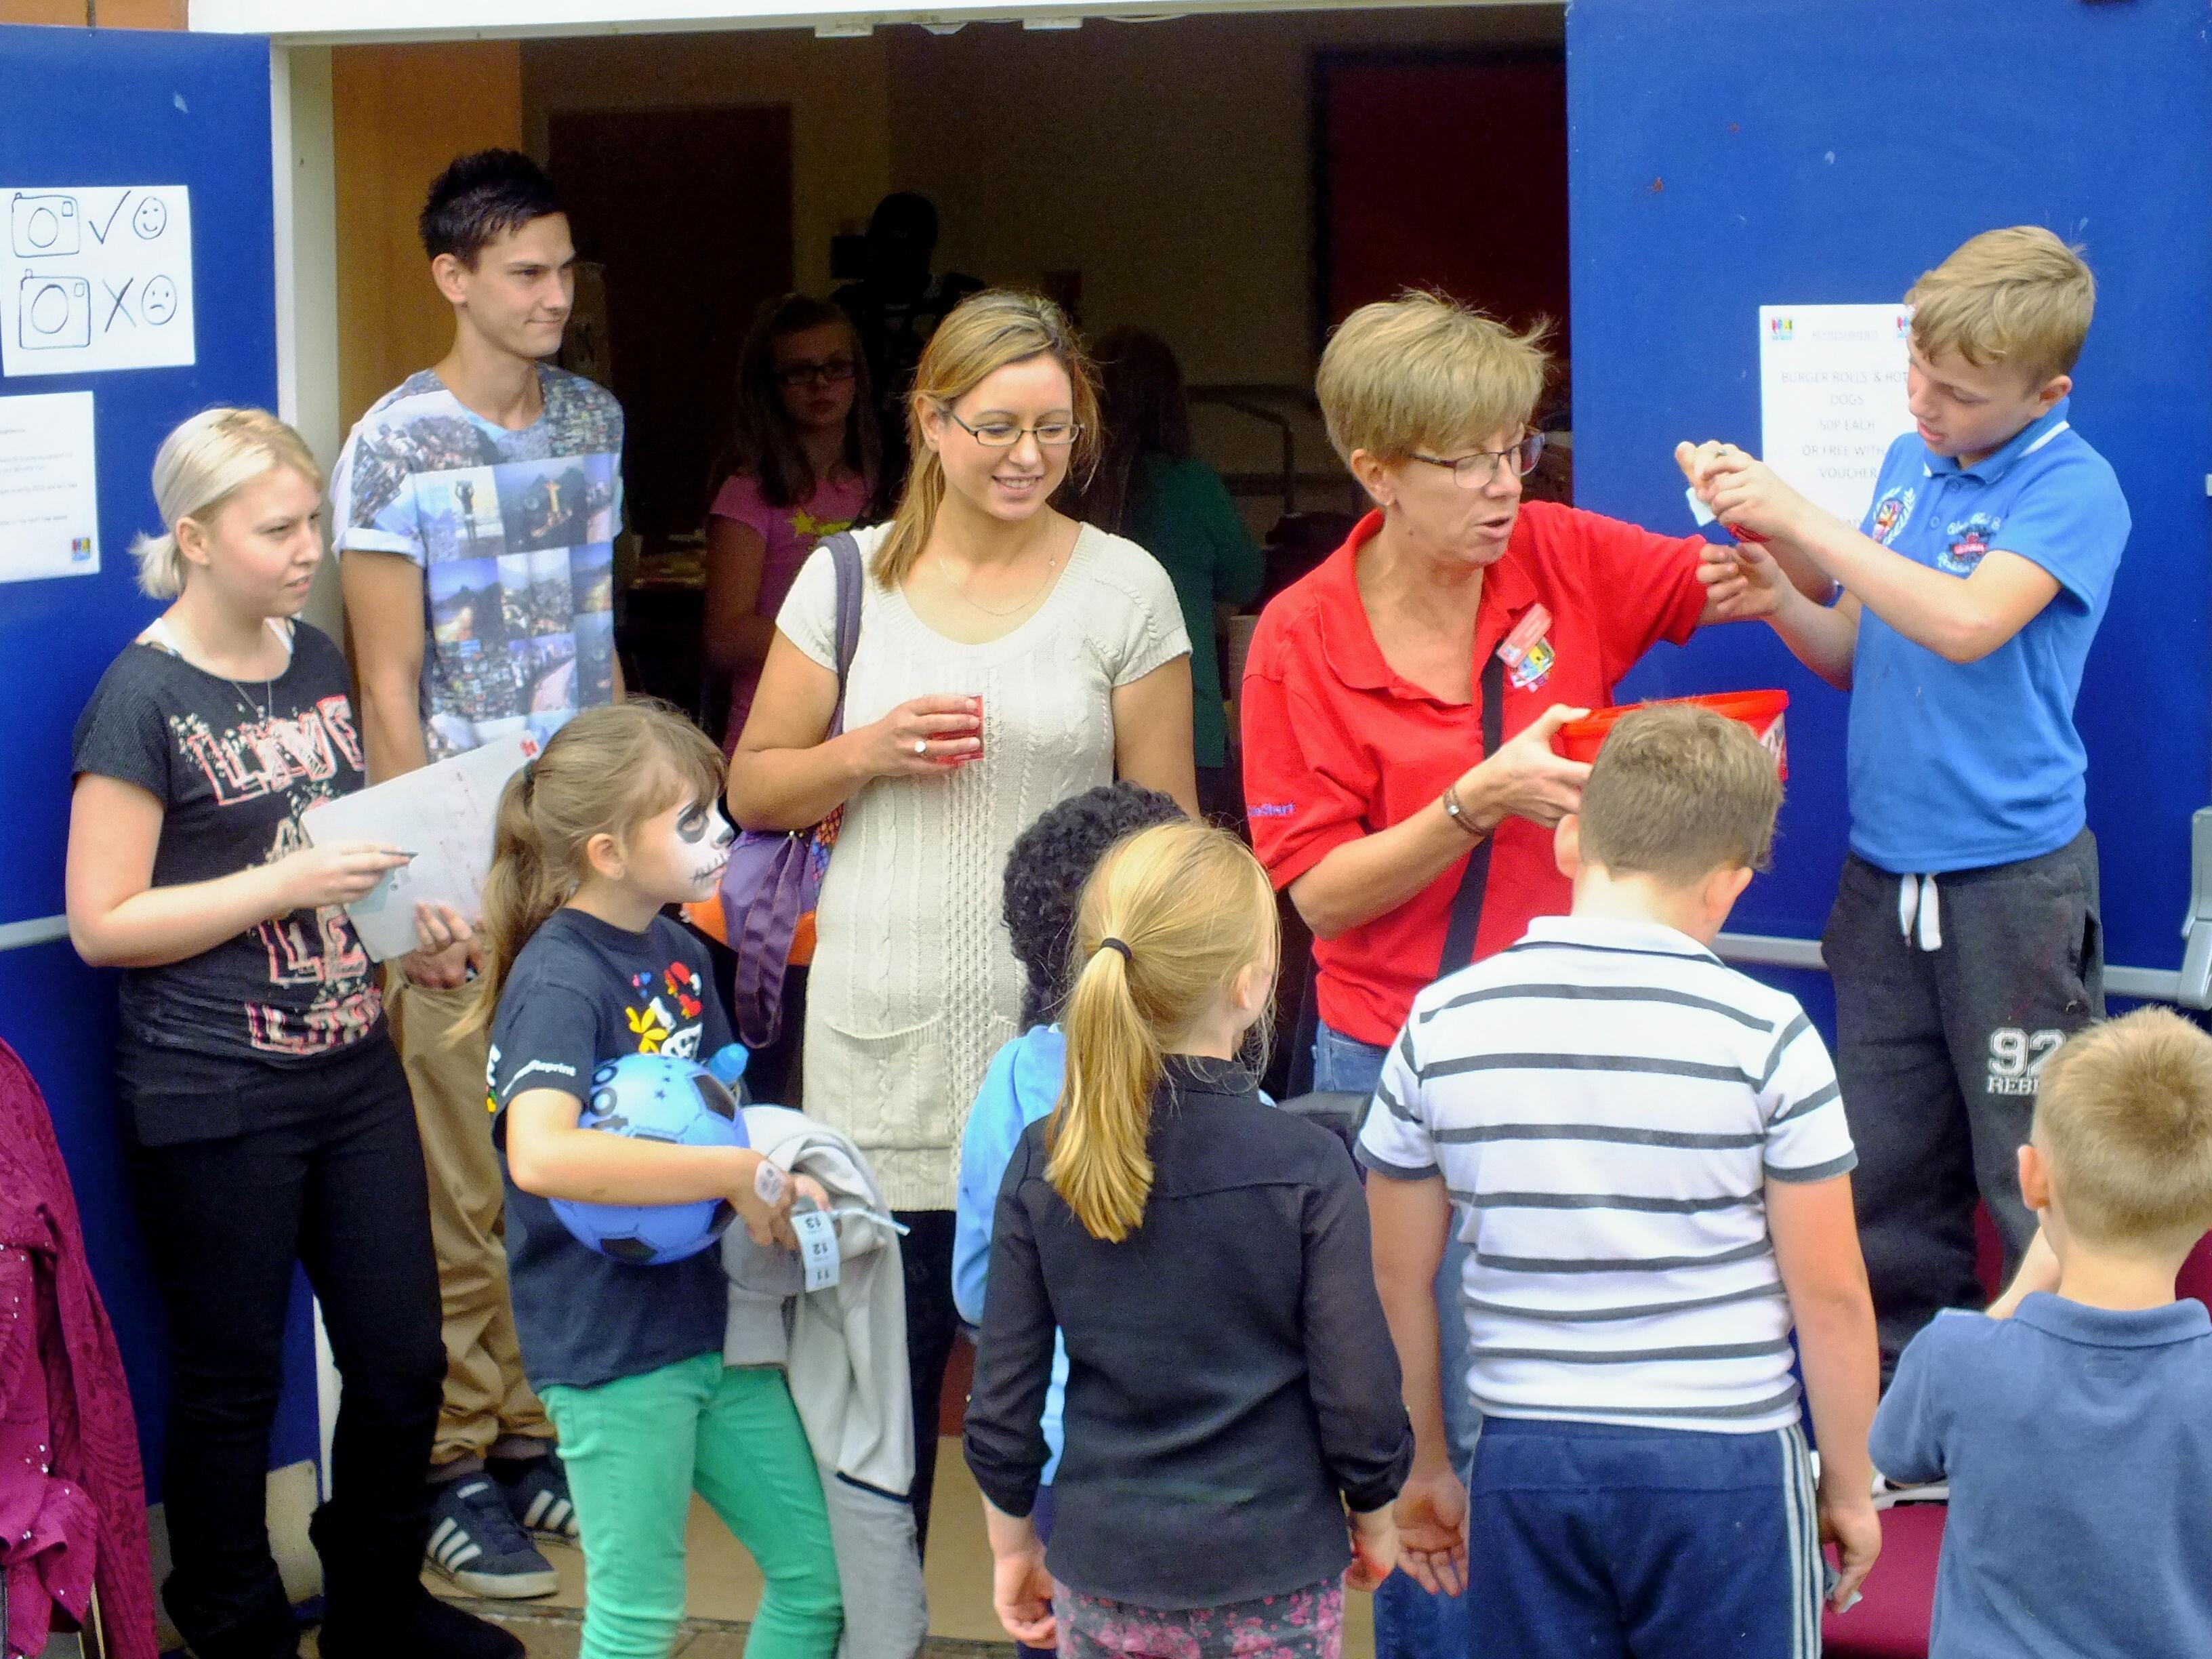 Blackthorn Good Neighbours, Community Centre Fun Day, Summer 2014.